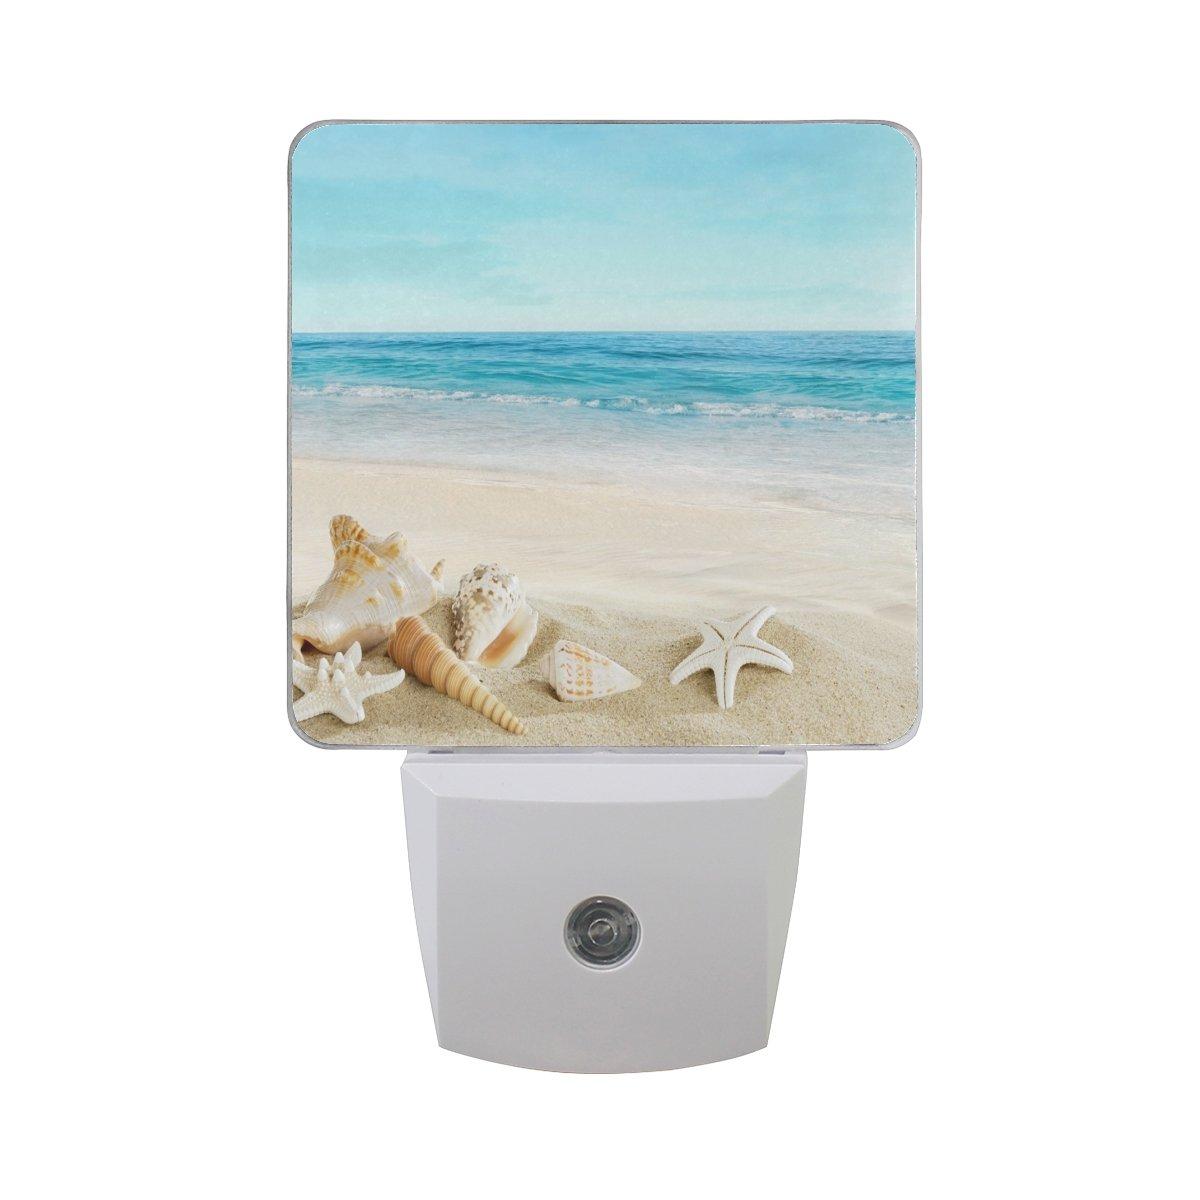 Alaza Seashells on tropical beachプラグインLED Dusk to Dawnセンサーナイトライト、cool-touchデザイン壁階段用ライト寝室キッチン、廊下、または任意暗い部屋 B07CQL7PN9 16045